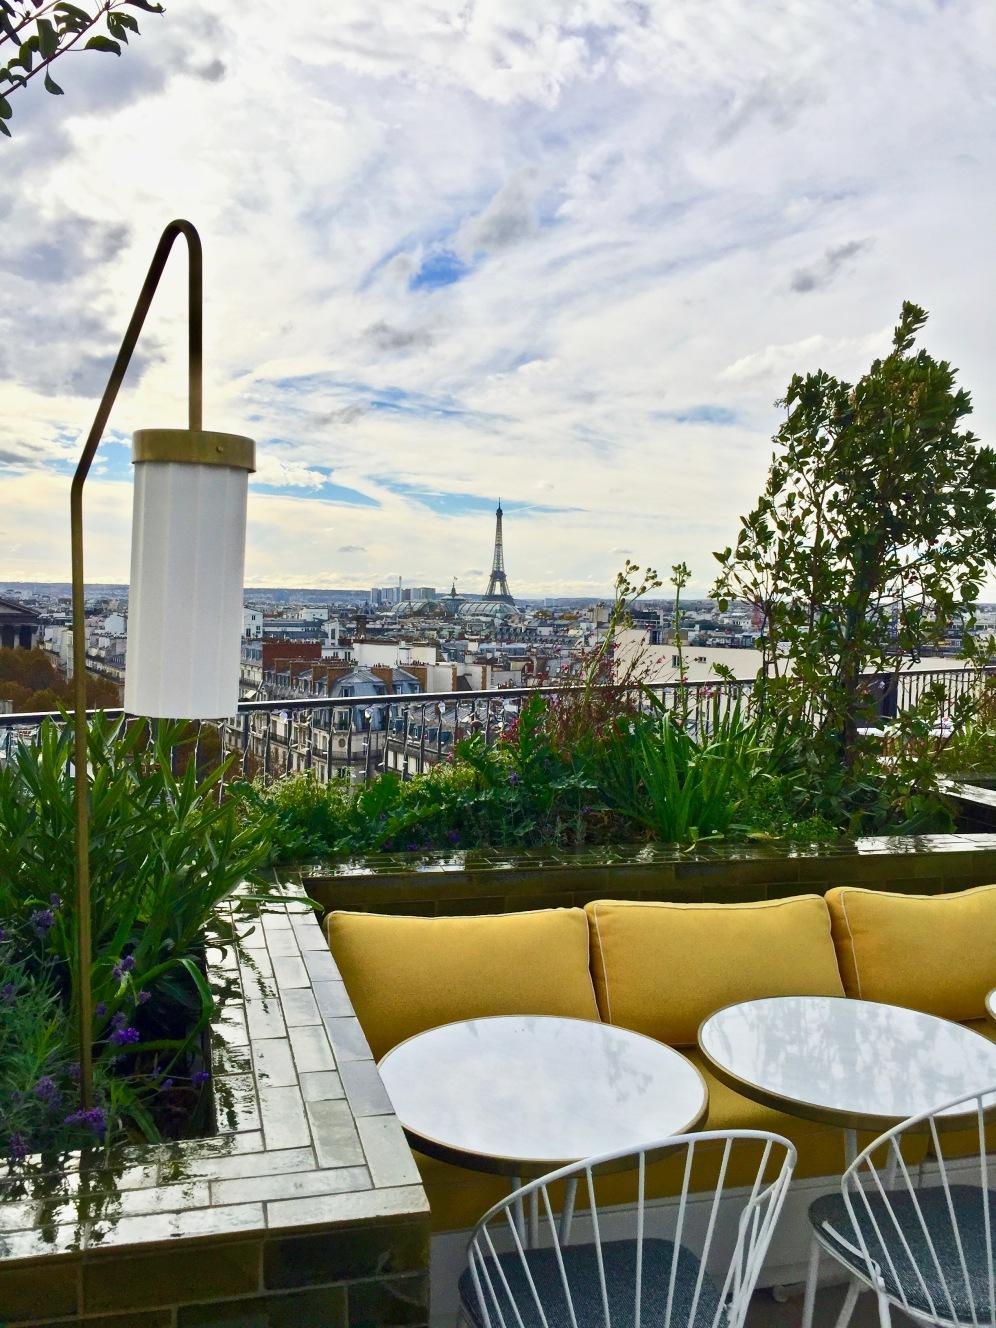 La terrasse - Perruche ©lepetitlugourmand